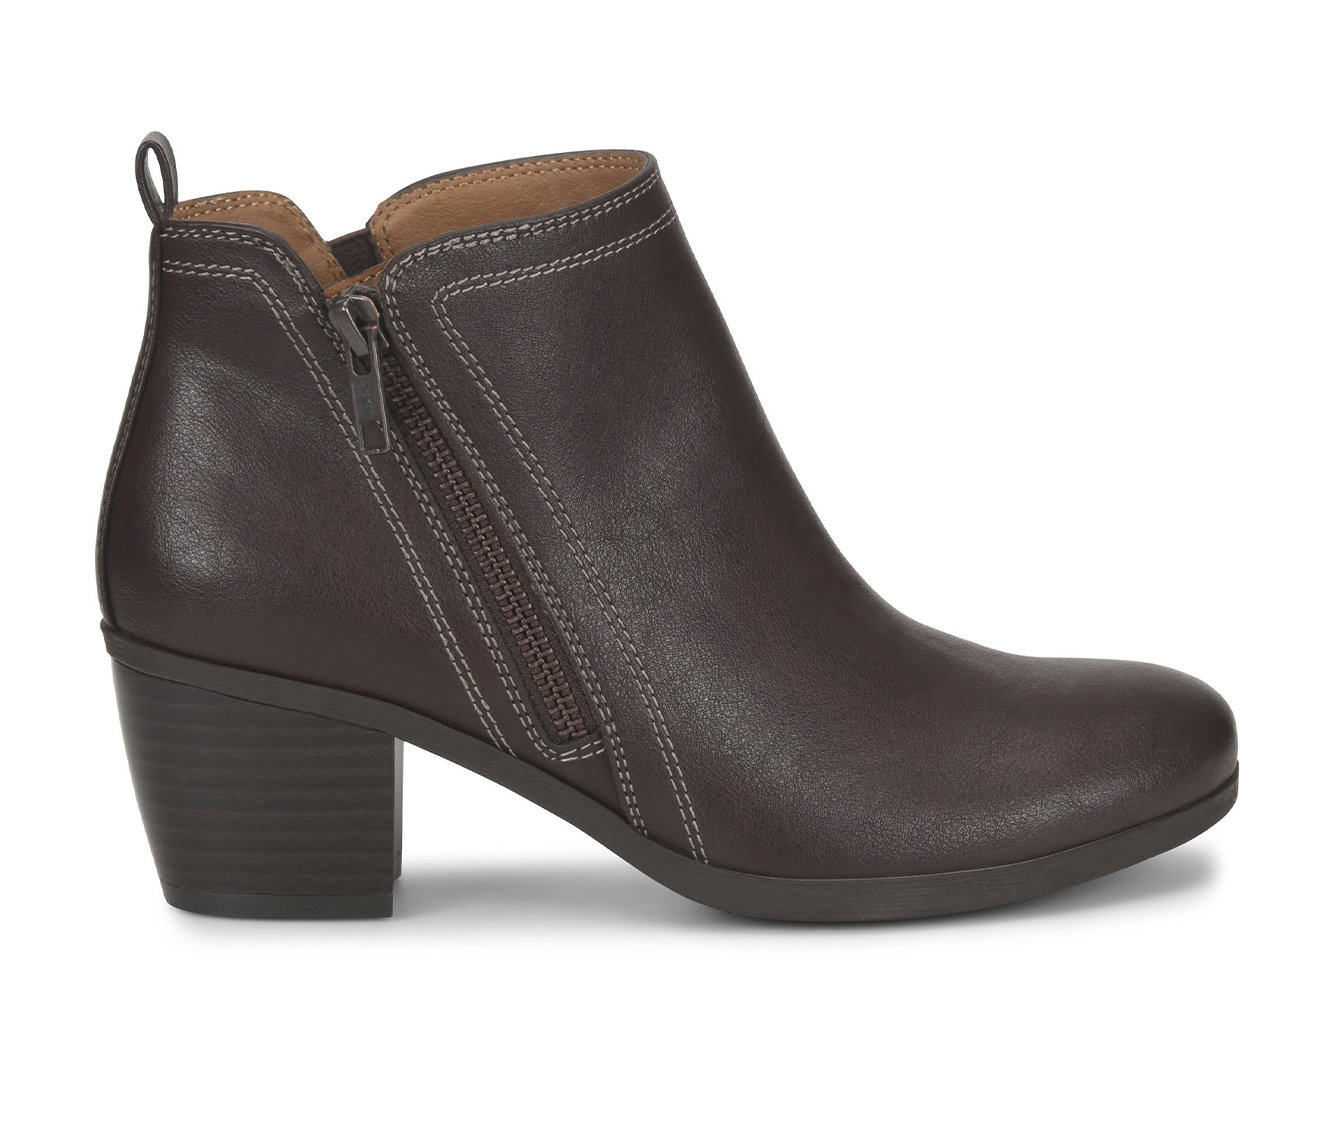 EuroSoft Adona Women's Boots (Brown - Faux Leather)